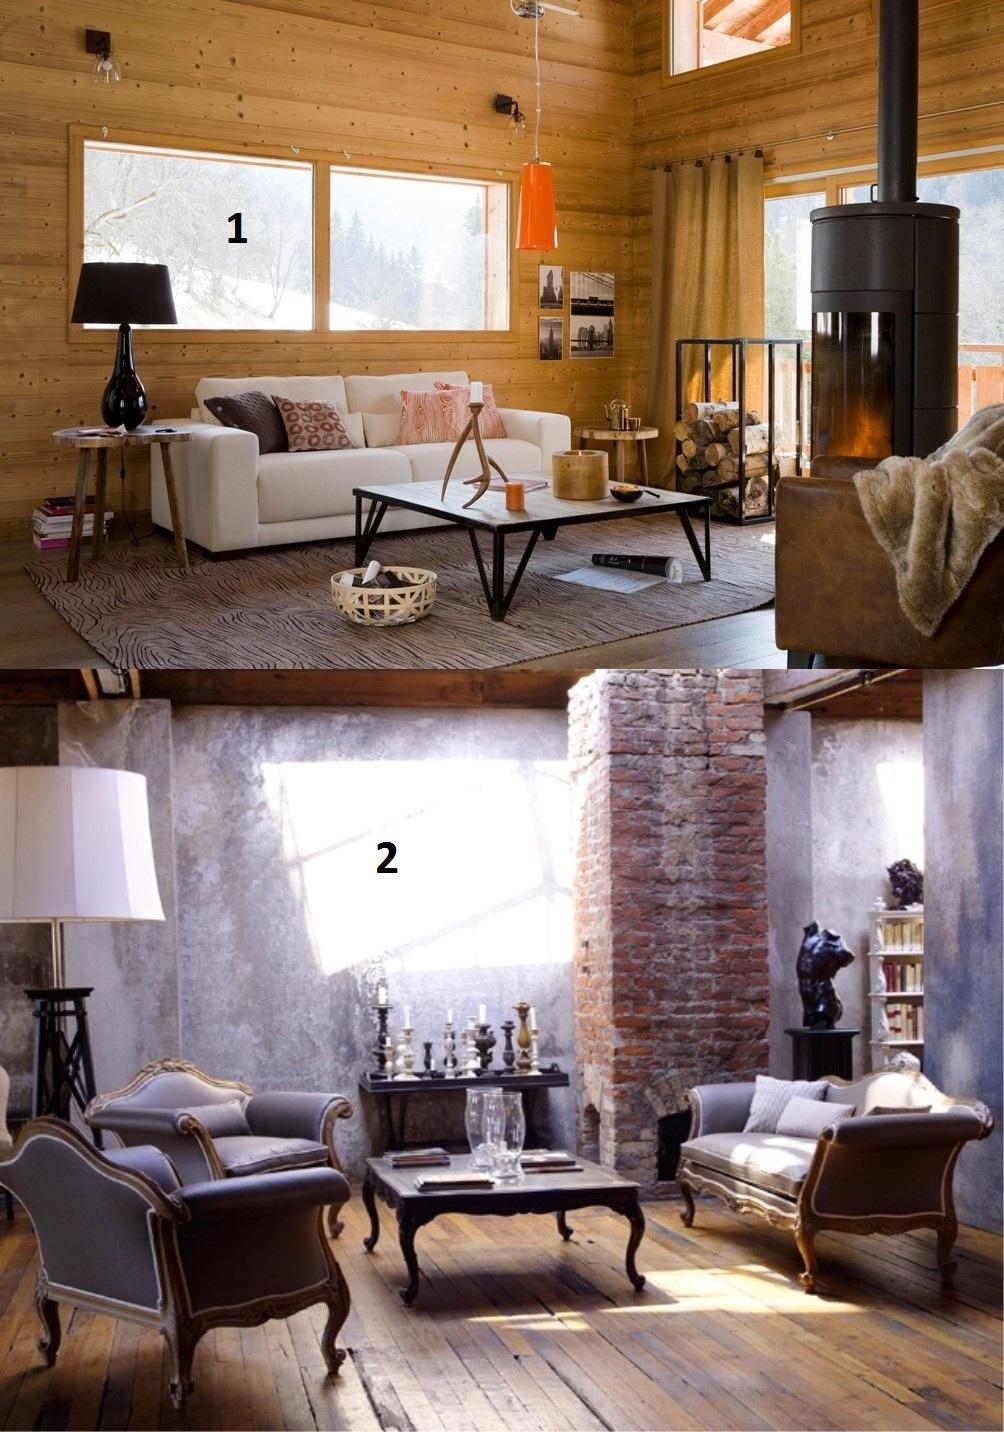 entre deux choix trucs astuces et id es d co. Black Bedroom Furniture Sets. Home Design Ideas